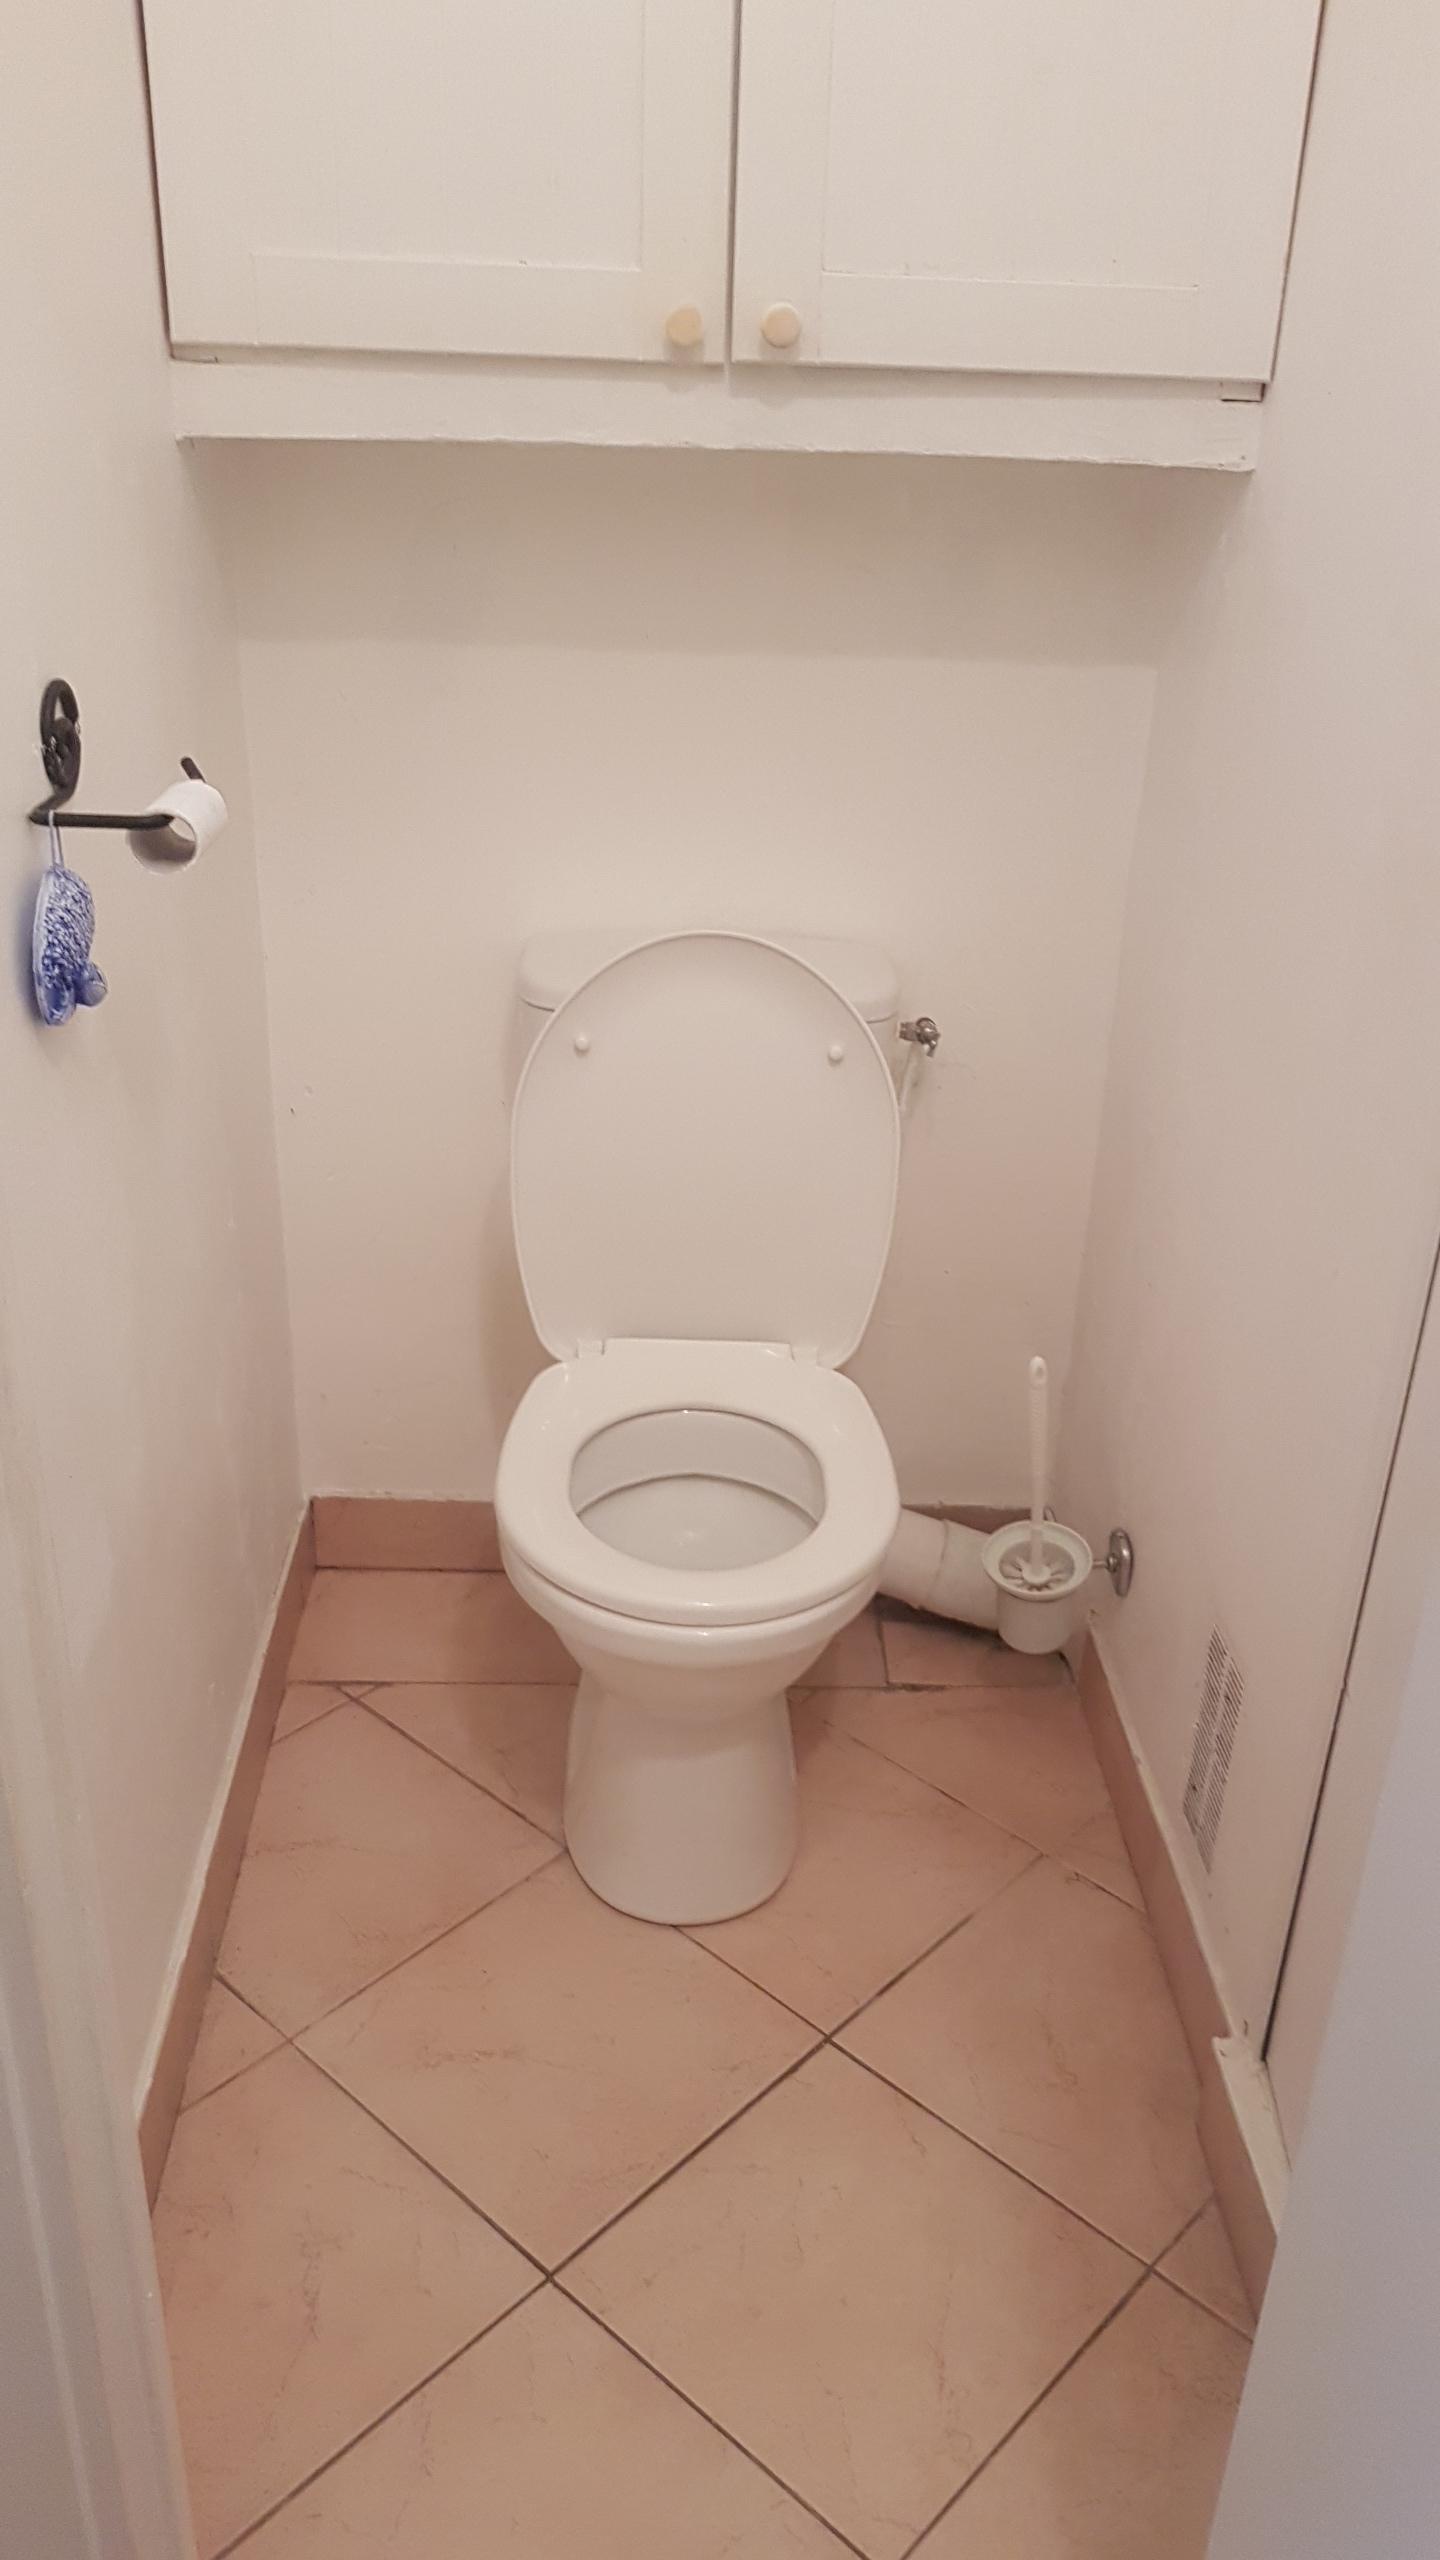 WC - AVANT